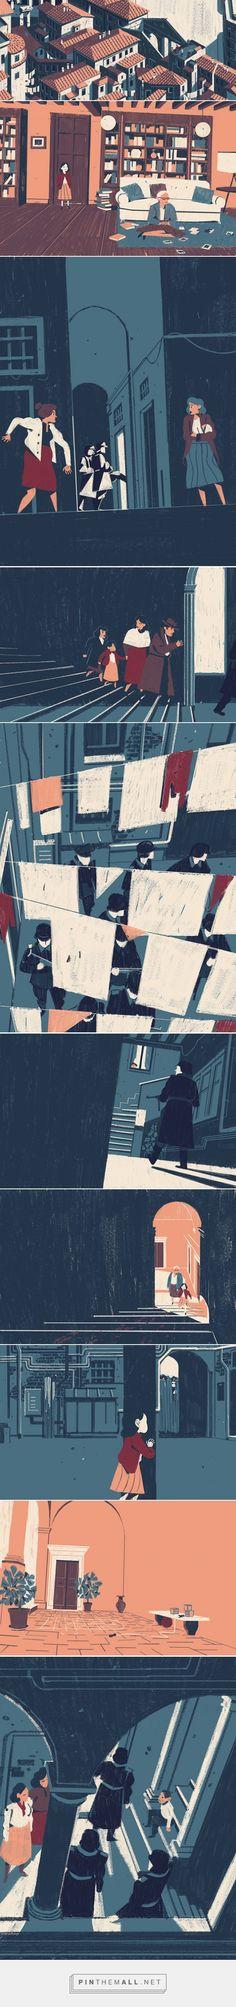 It's Nice That : Matteo Berton's considered illustrations of a Nazi raid on a Jewish community - created via http://pinthemall.net